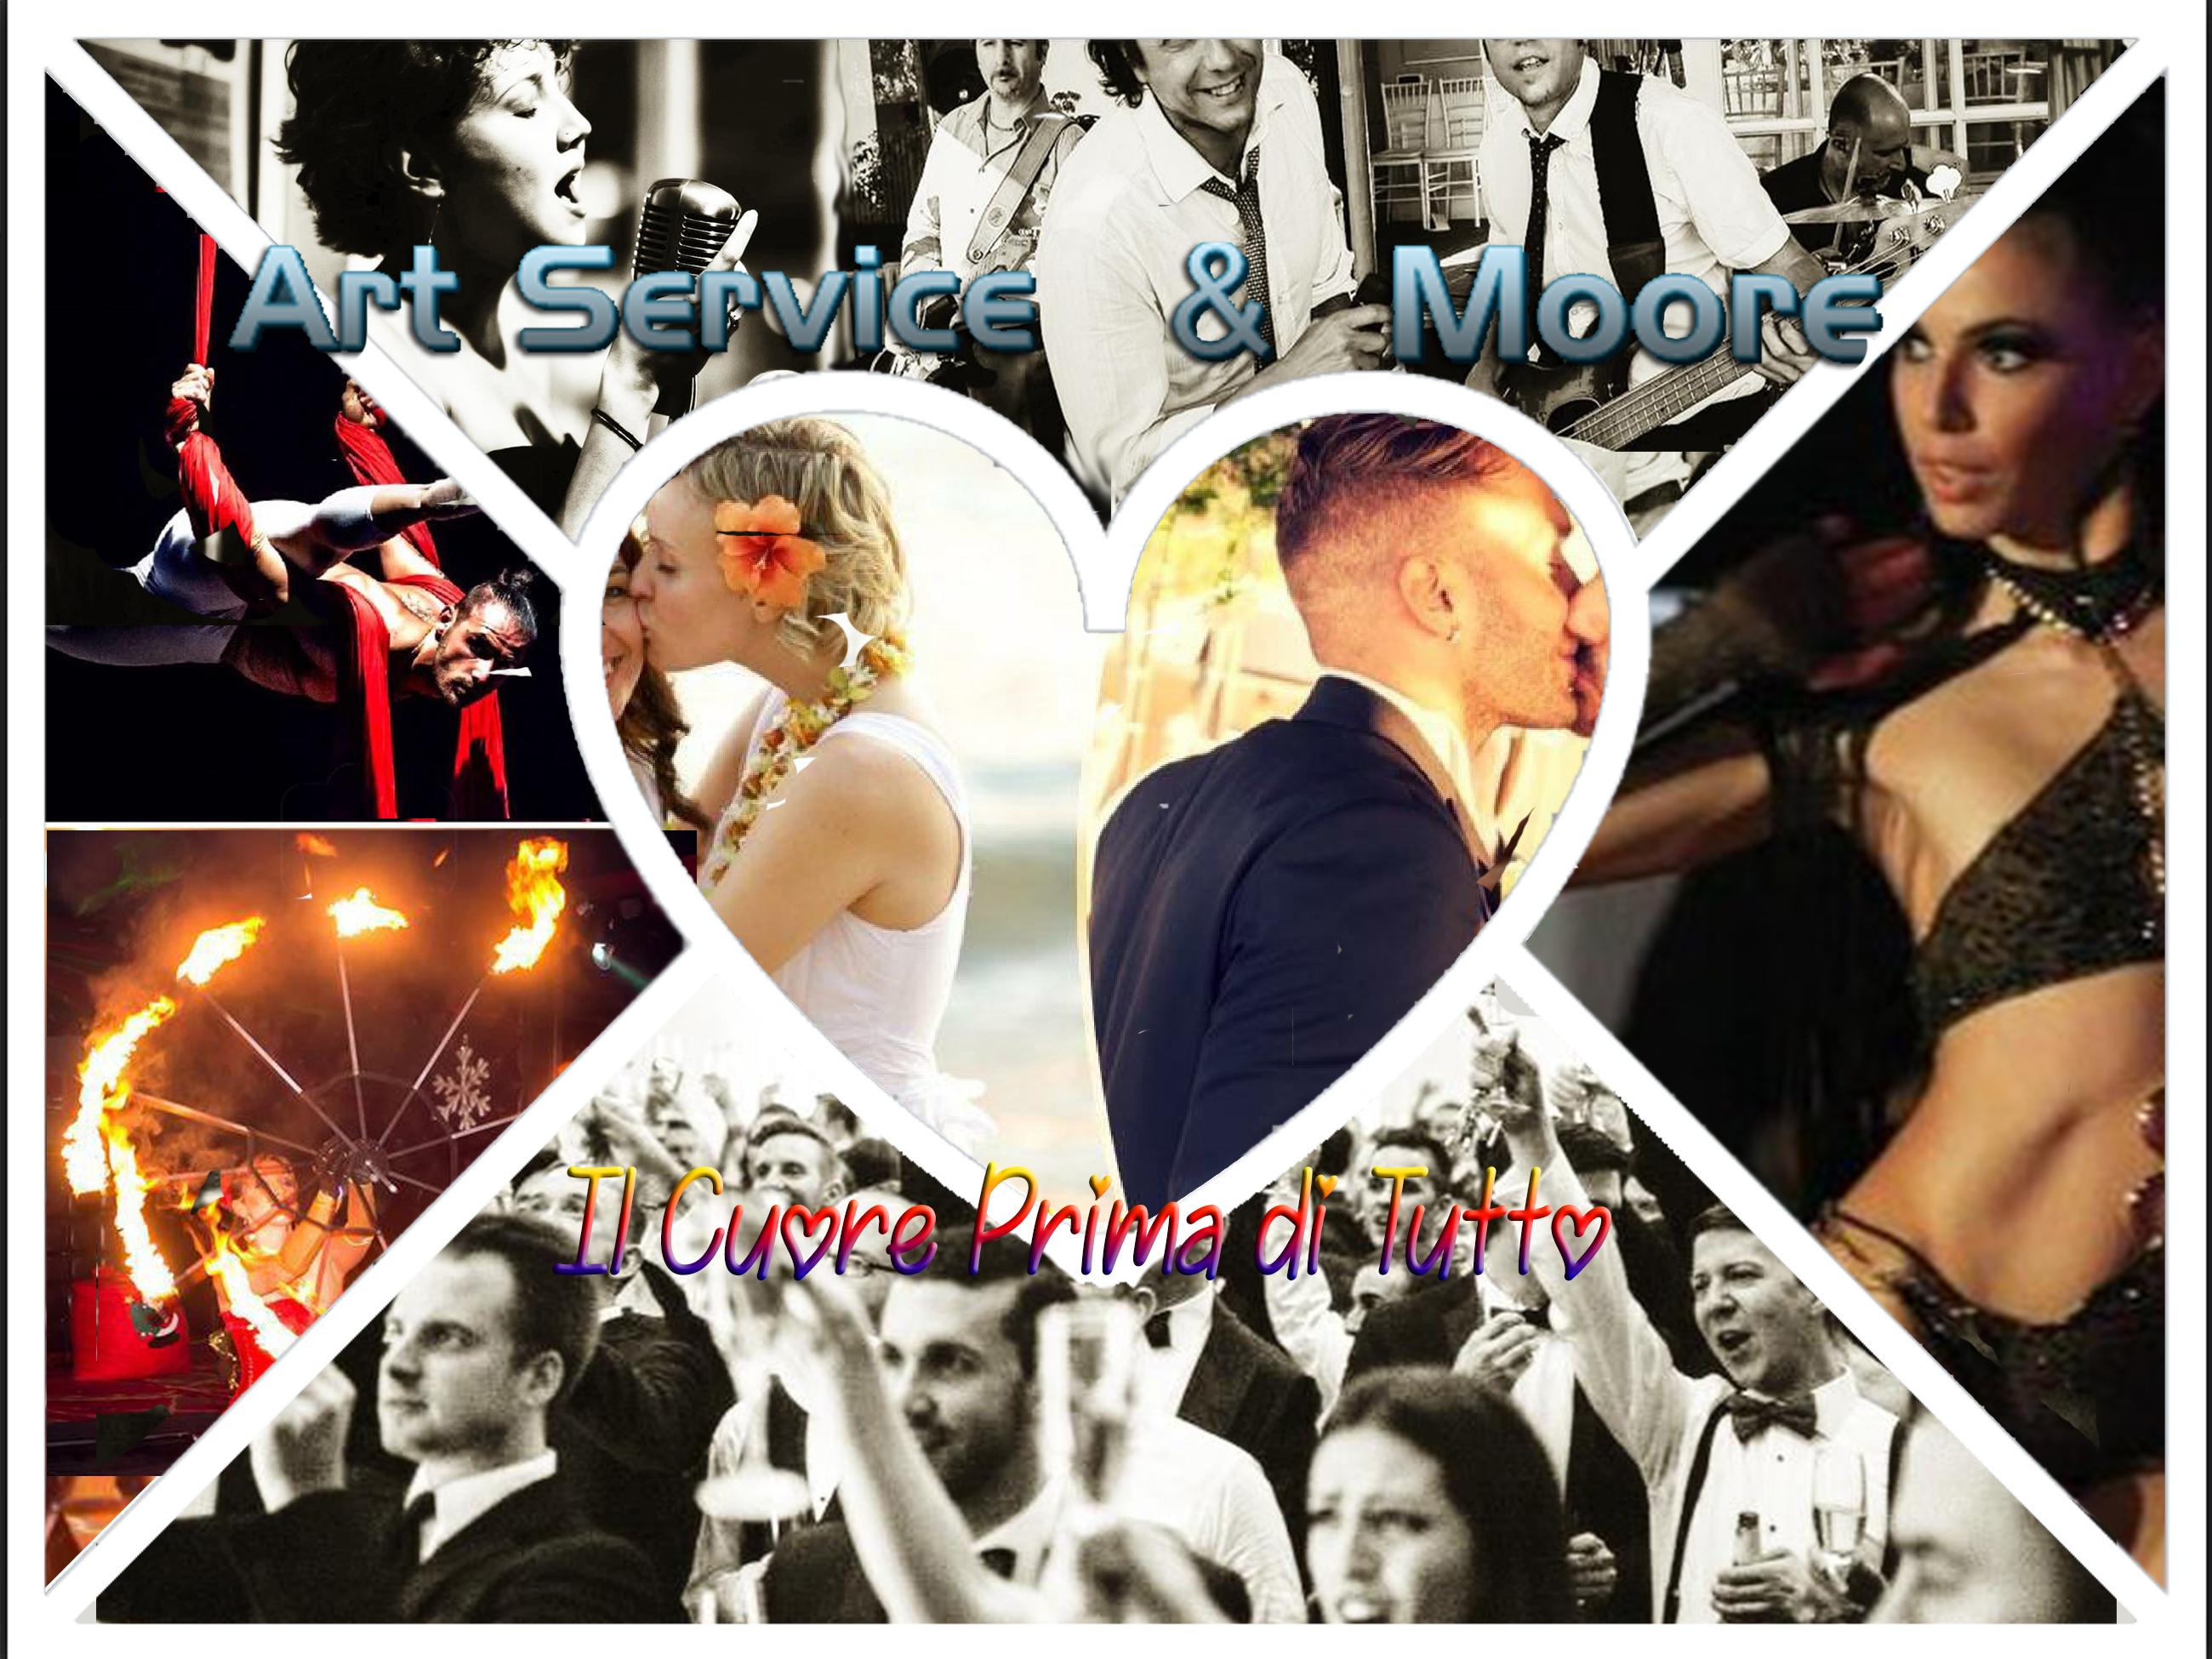 ART Service & Moore - il vostro WEDDING PLANNER MUSICALE